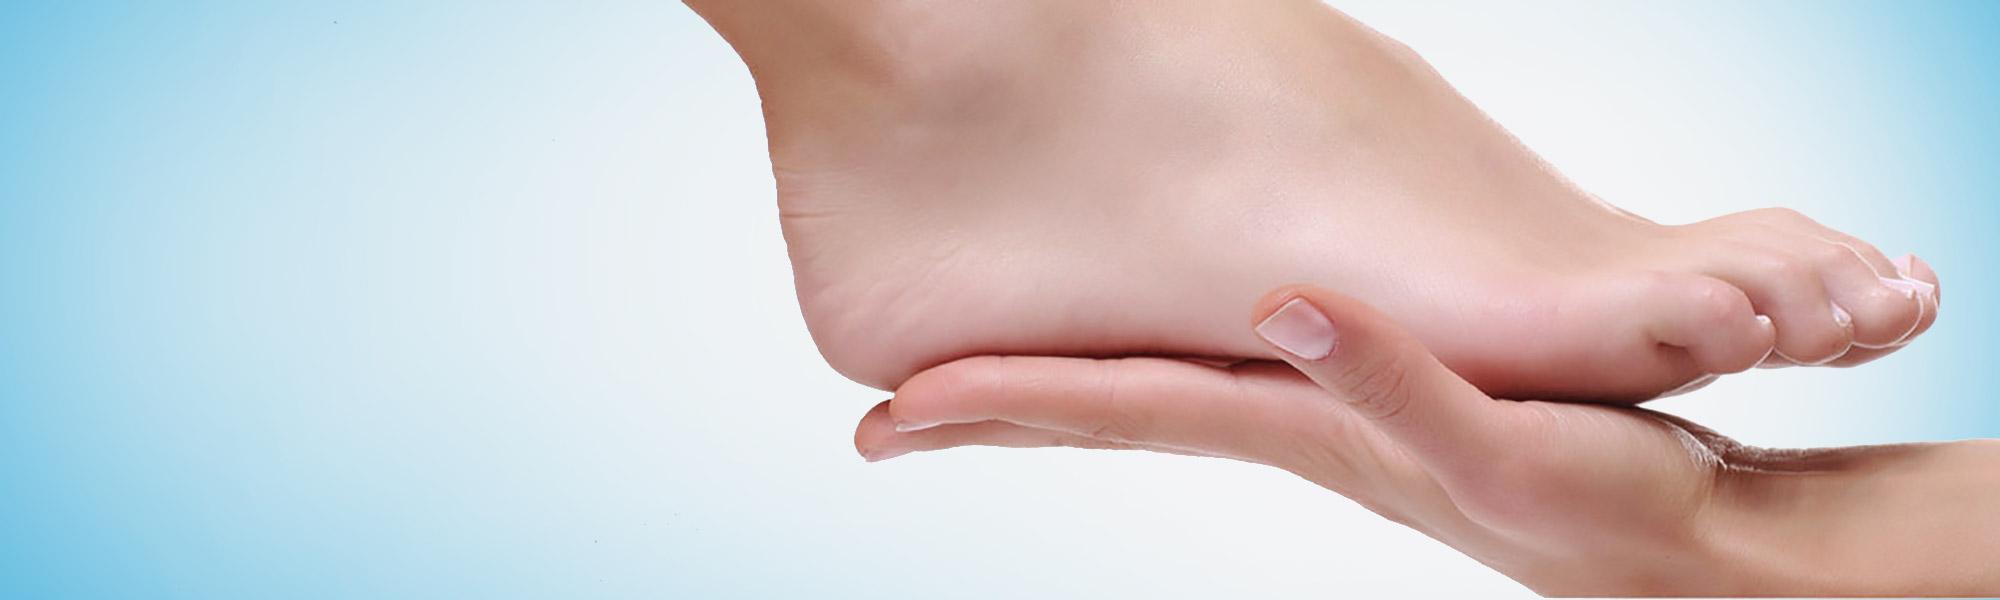 visita baropodometrica del piede